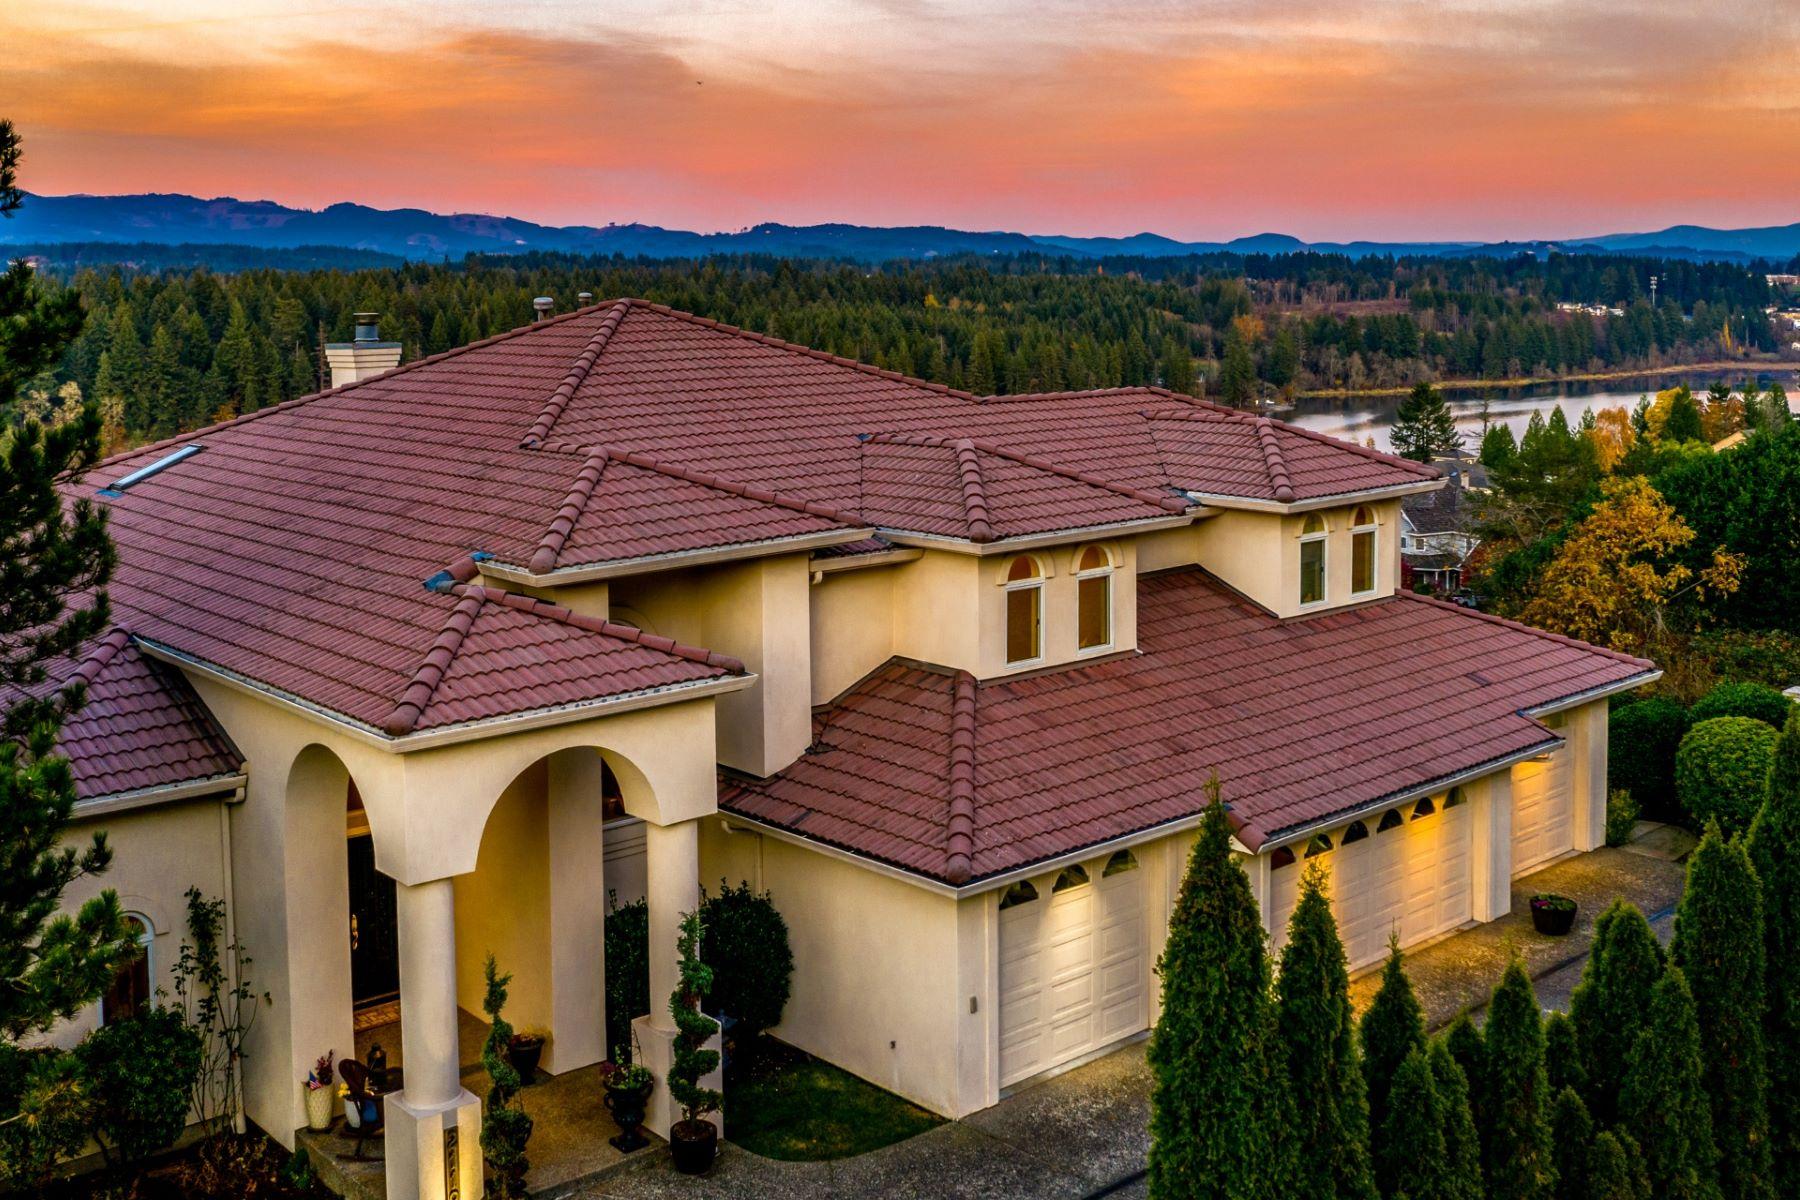 Single Family Homes for Sale at Stunning Amenities, Lake Views 2119 NW Lake Rd Camas, Washington 98607 United States